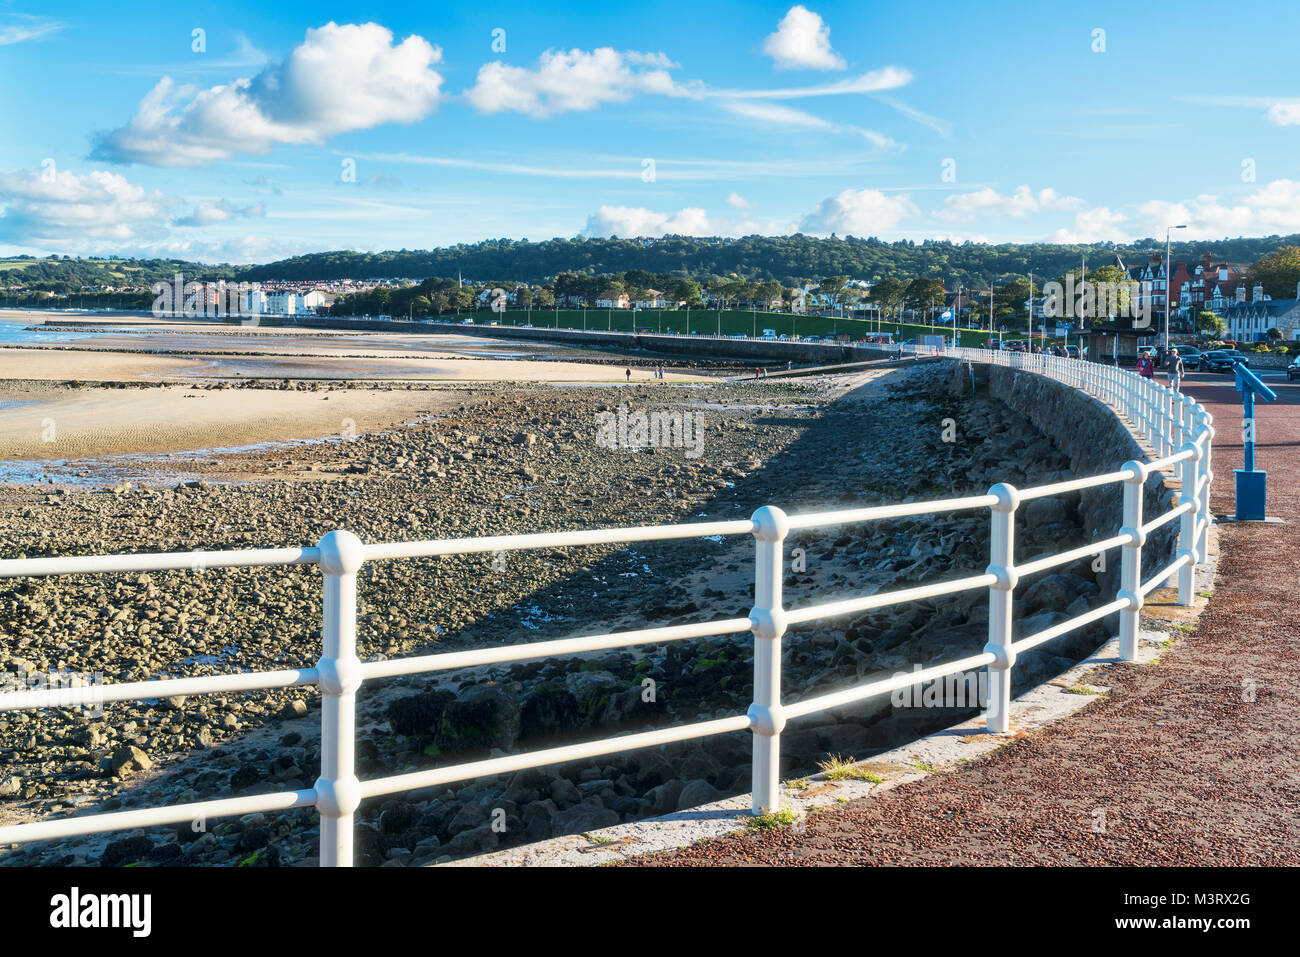 Promenade  Rhos on Sea, Colwyn Bay, seafront, north Wales, UK - Stock Image